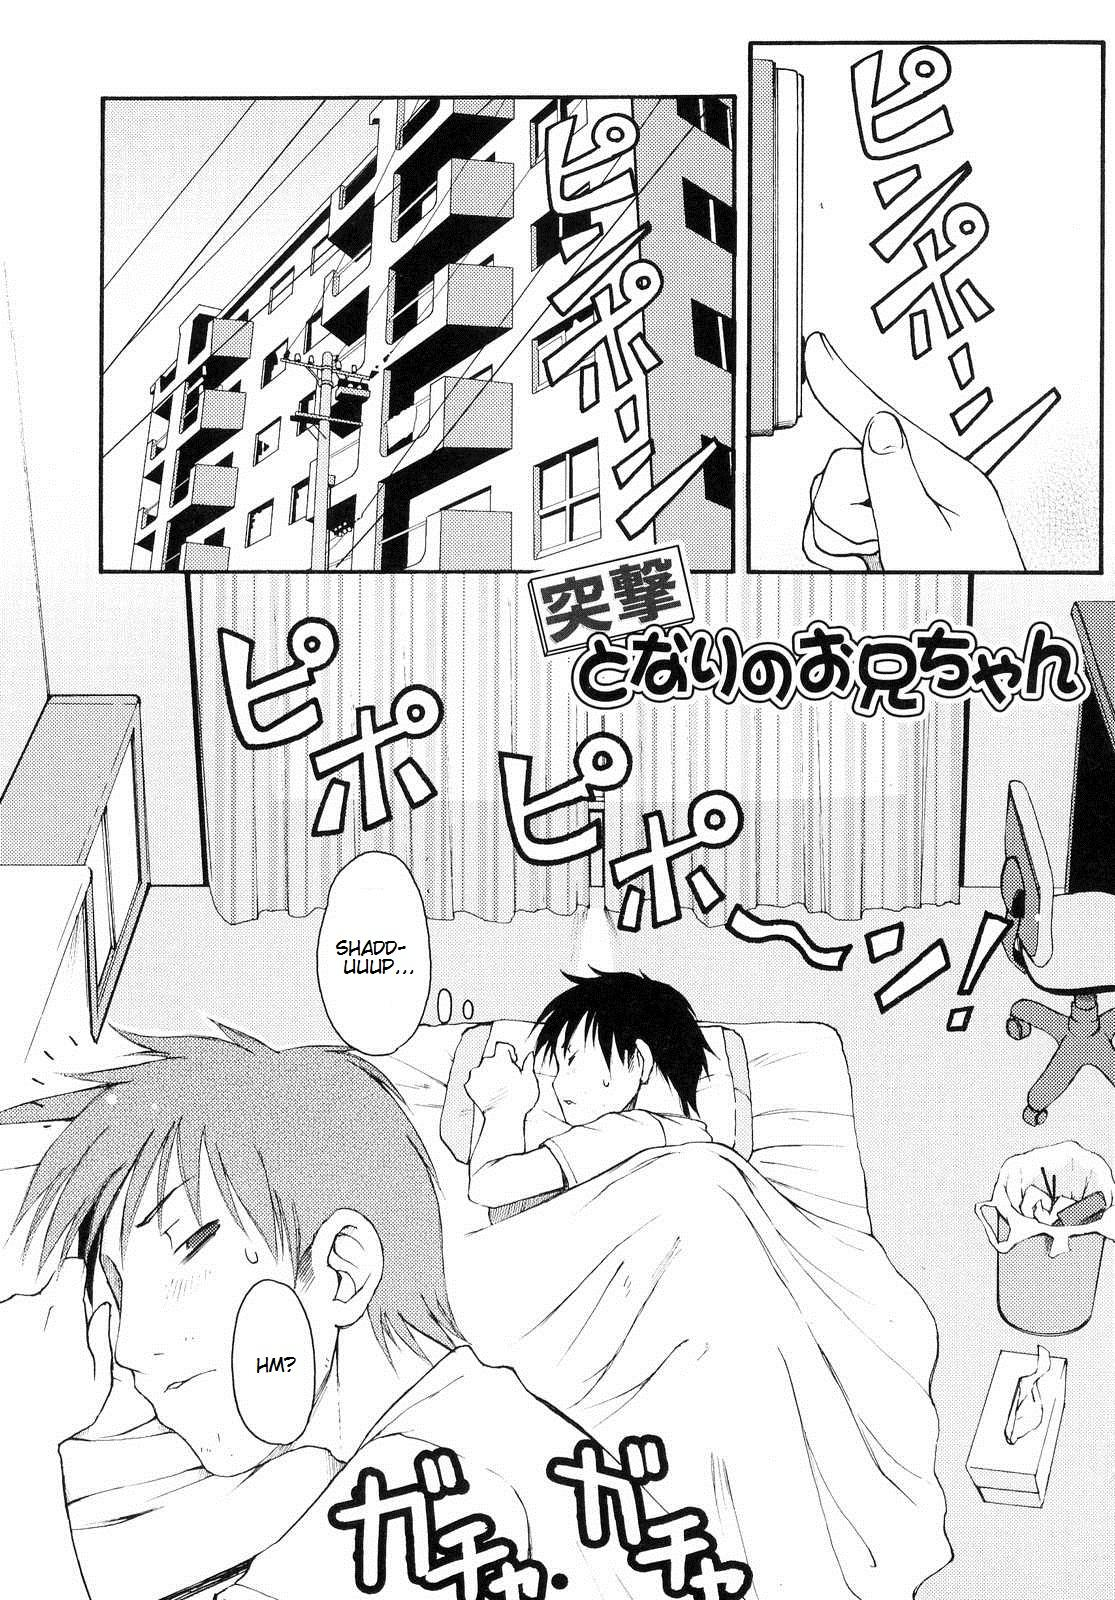 [LEE] Totsugeki Tonari no Onii-chan Ch. 1-7 [ENG] 71